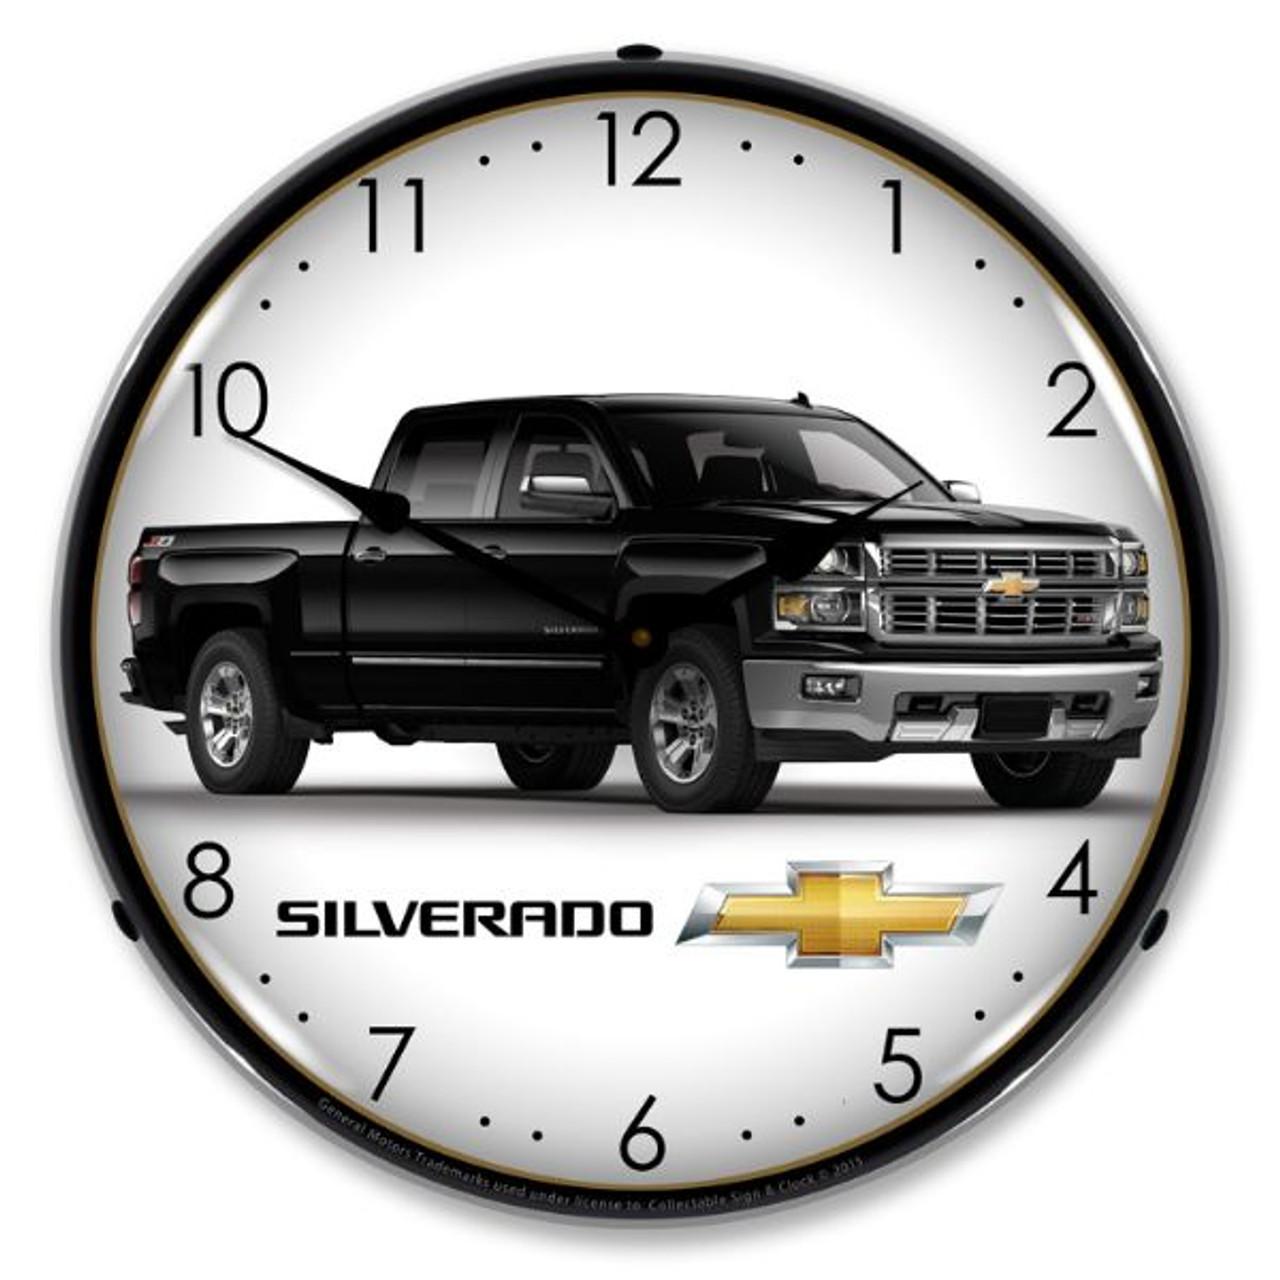 Chevrolet Silverado Black Lighted Wall Clock 14 x 14 Inches